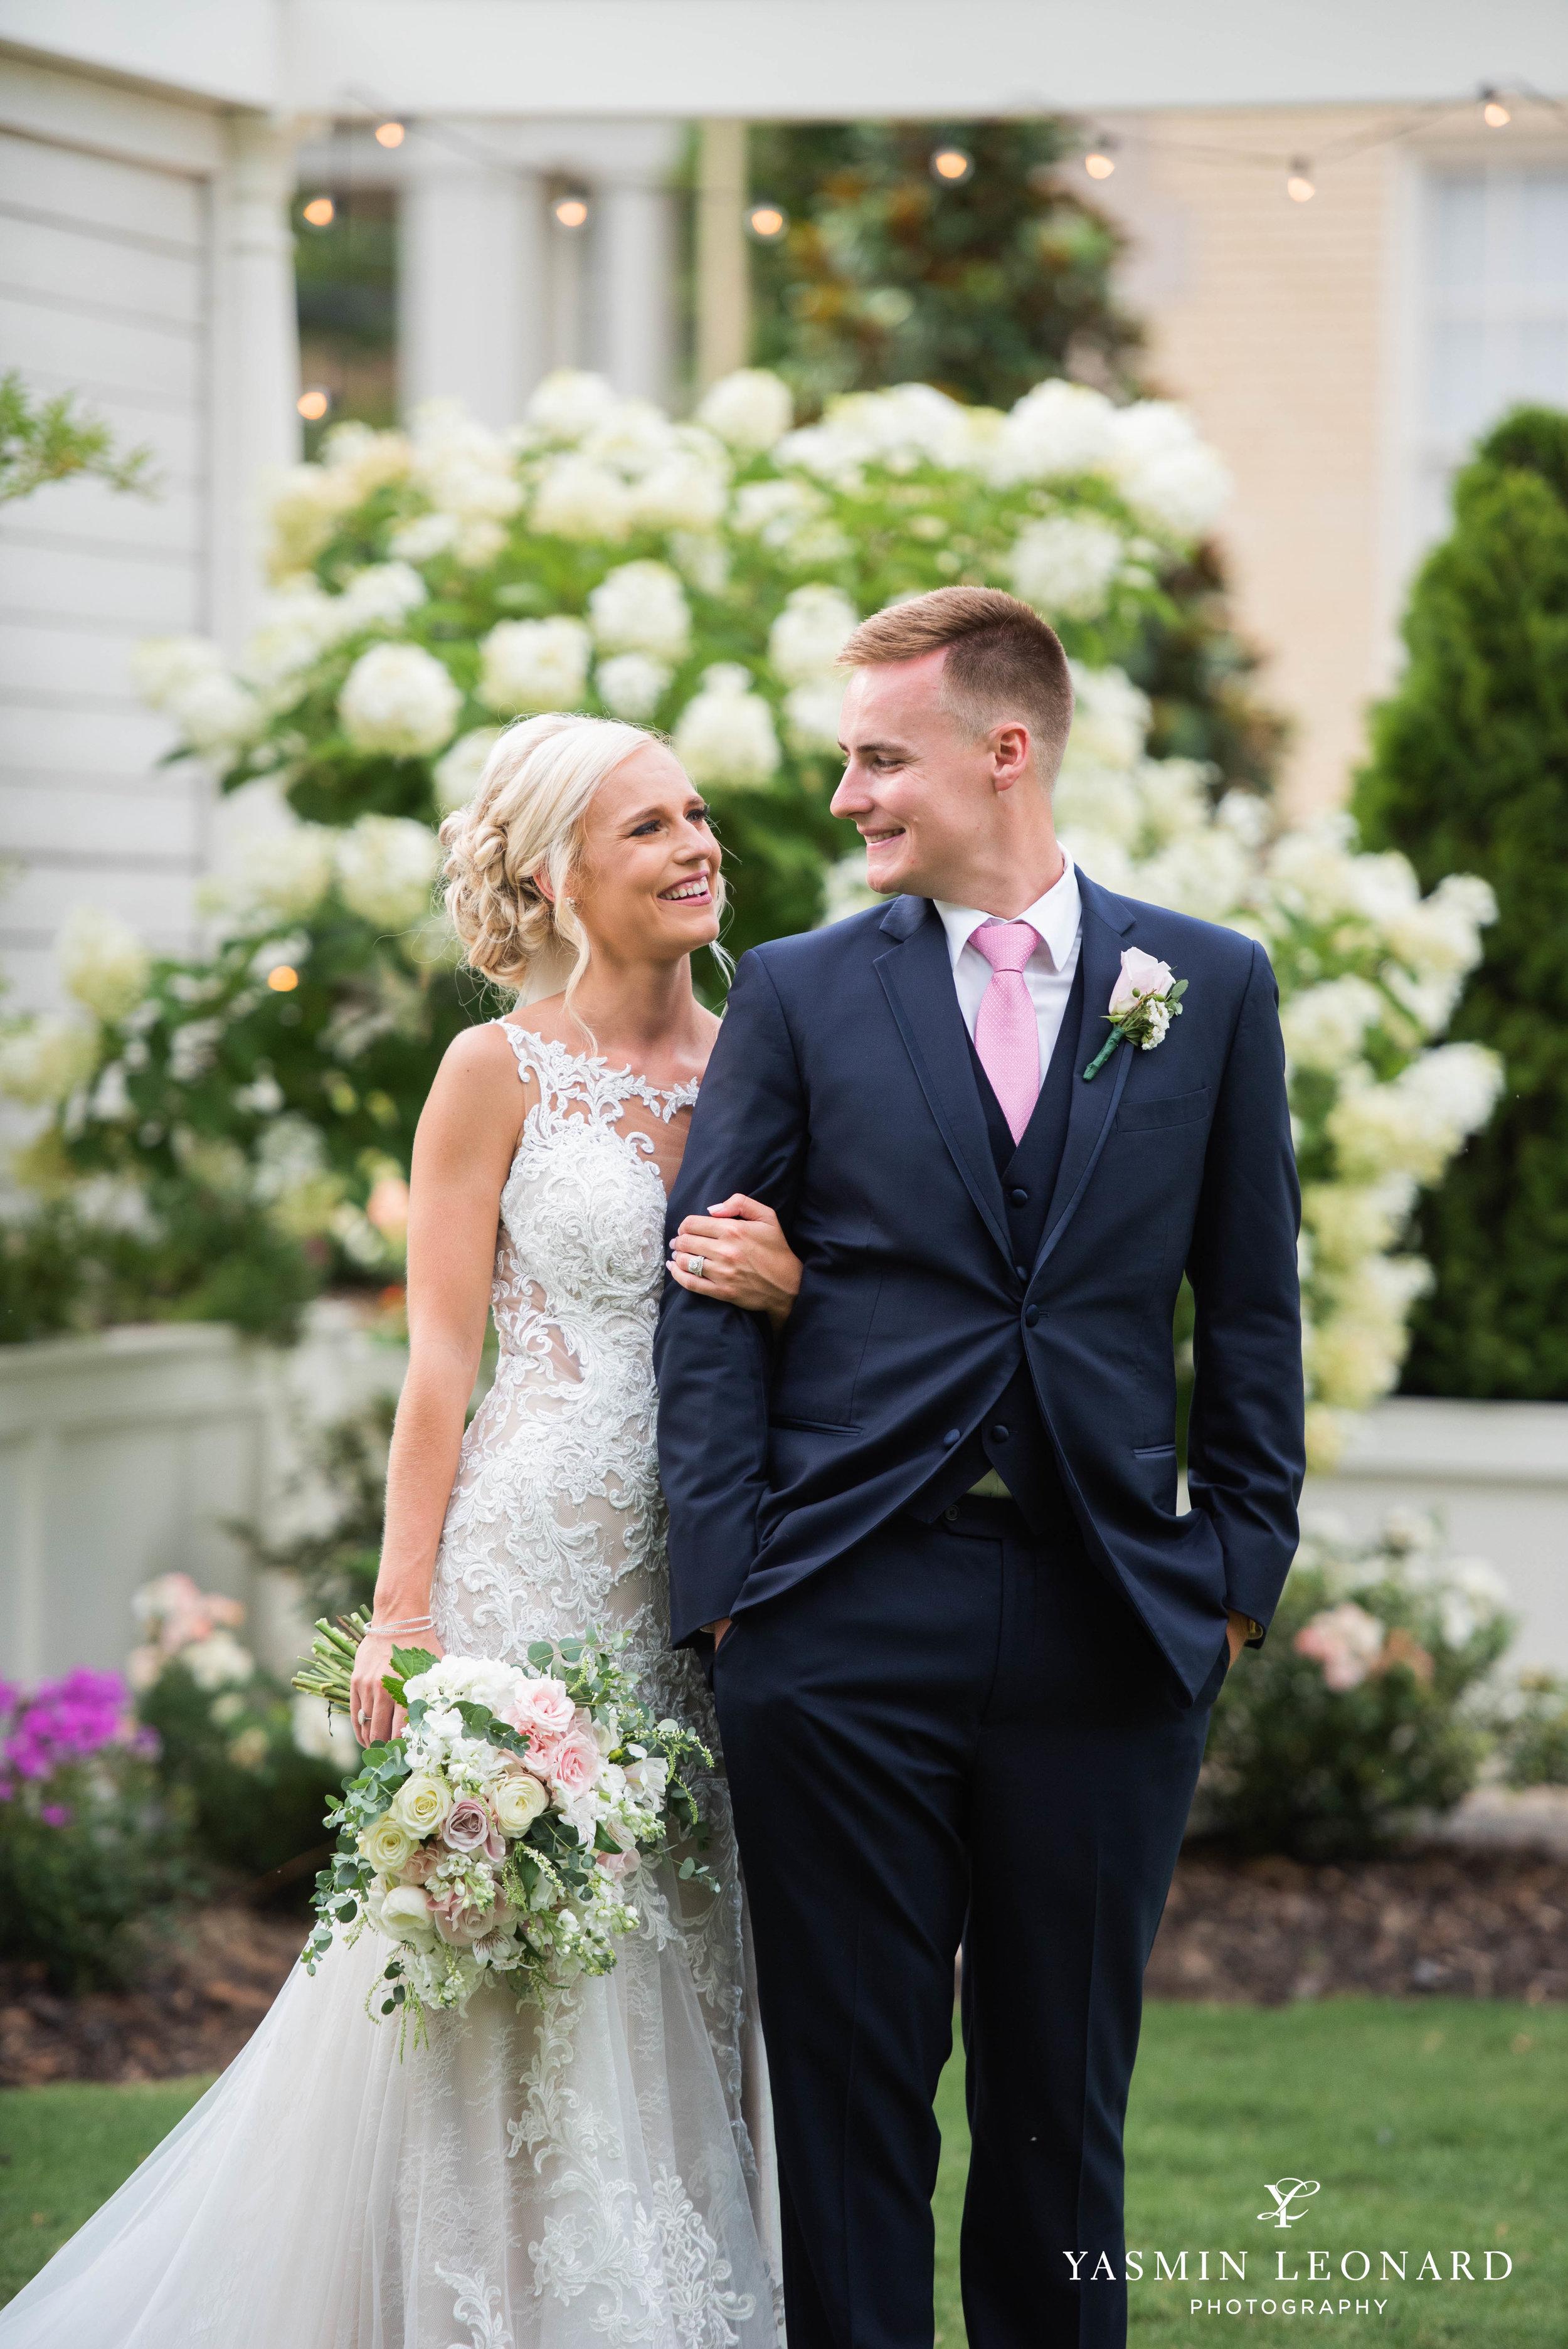 Separk Mansion - NC Weddings - Gastonia Wedding - NC Wedding Venues - Pink and Blue Wedding Ideas - Pink Bridesmaid Dresses - Yasmin Leonard Photography-32.jpg